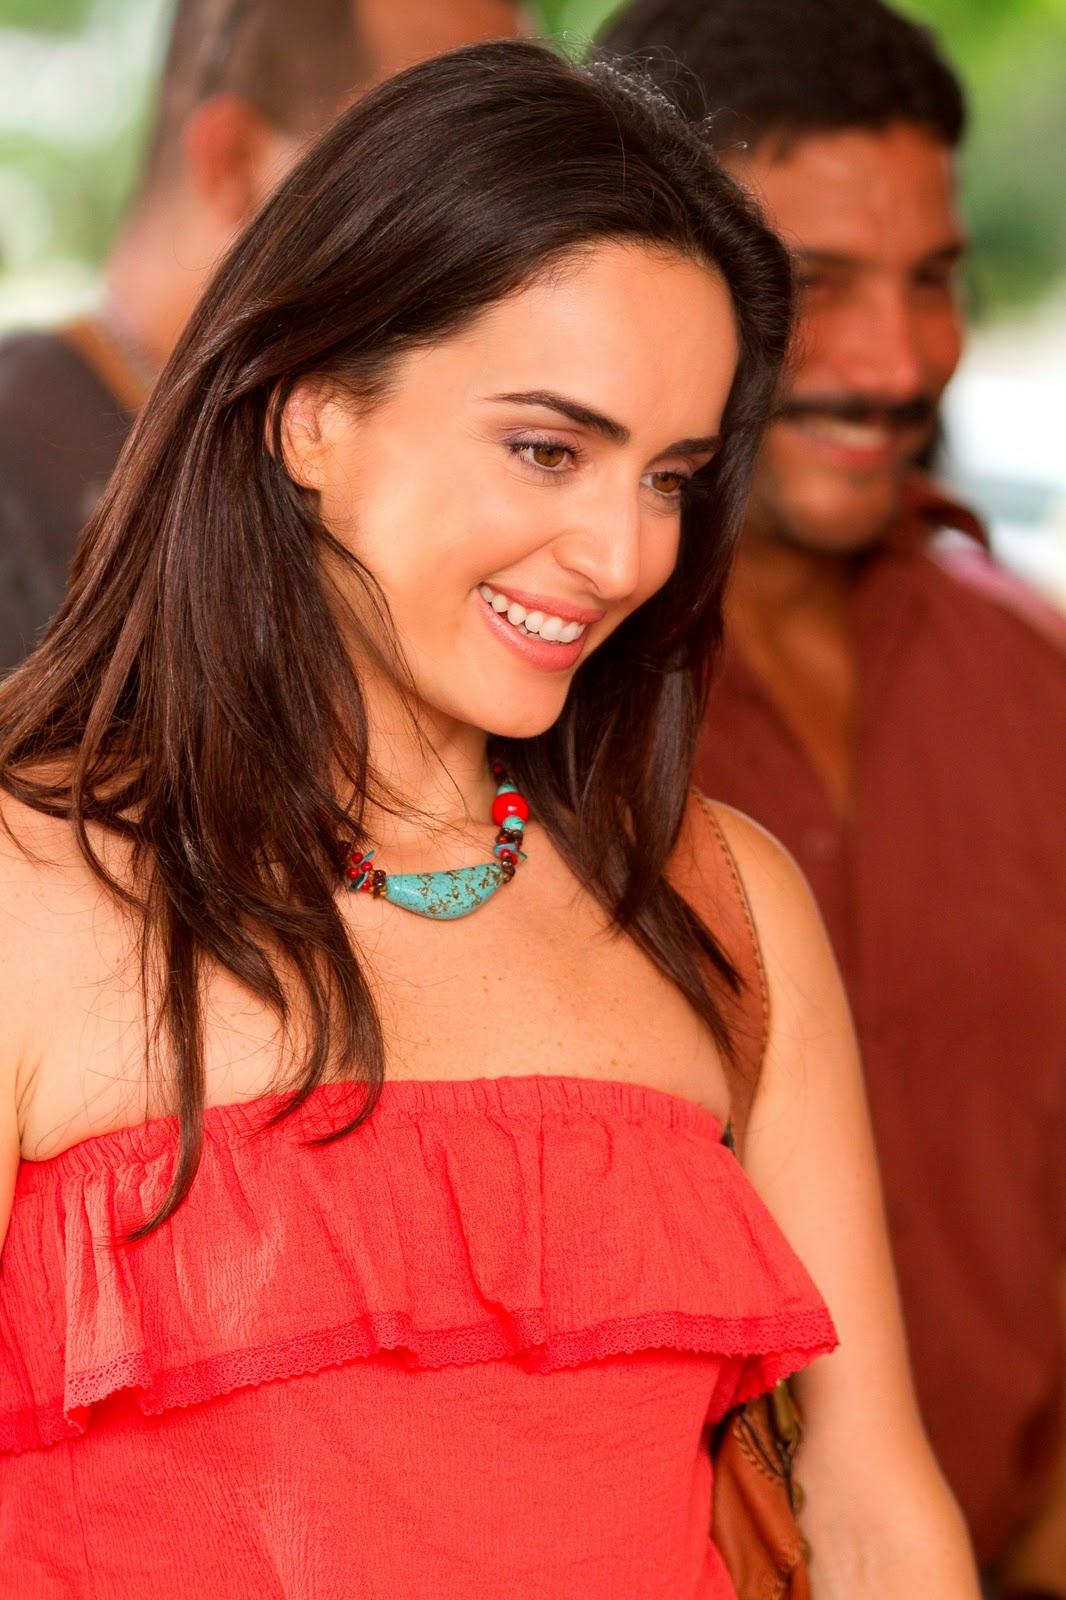 Interview Can Ana De La Reguera Tame Kenny Powers Soraya Vogt Blog